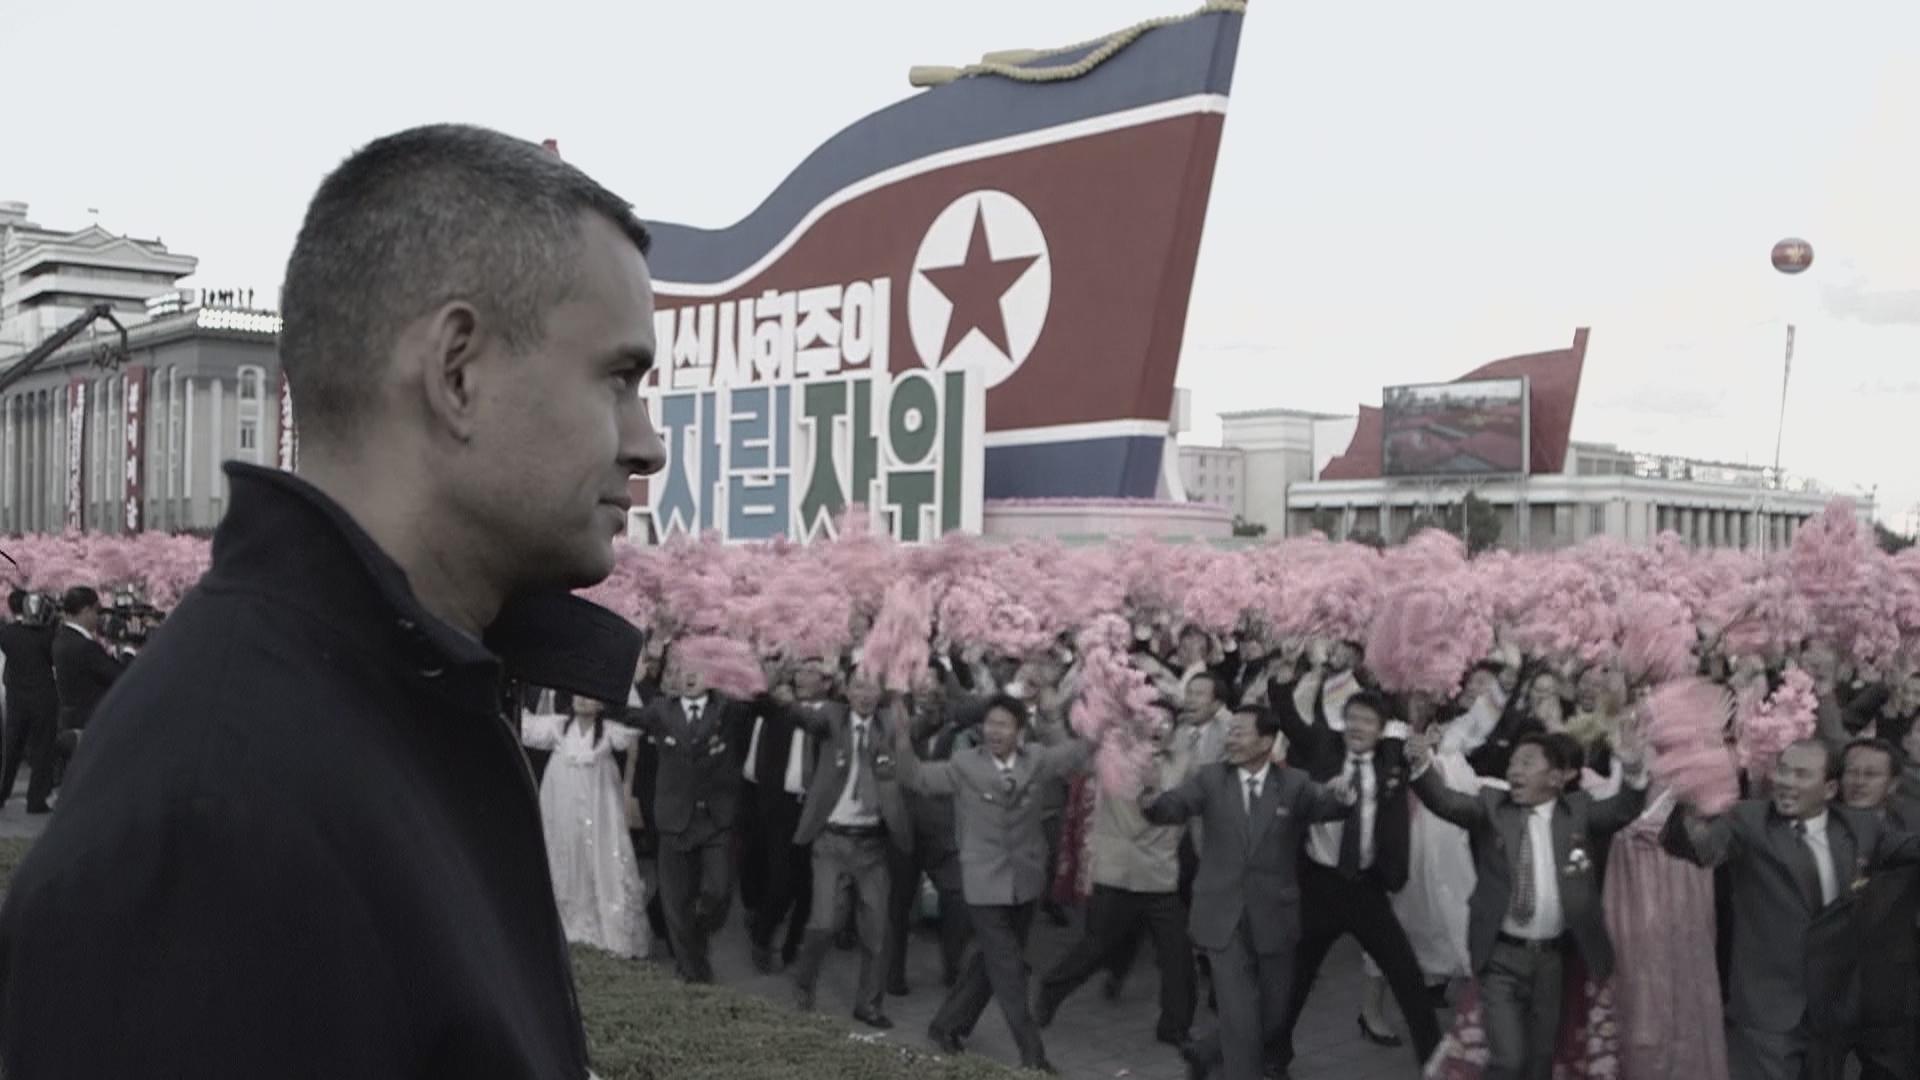 9235450_jbw_horisont_nordkoreas_afhoppere_pgm-00.04.15.09.jpeg